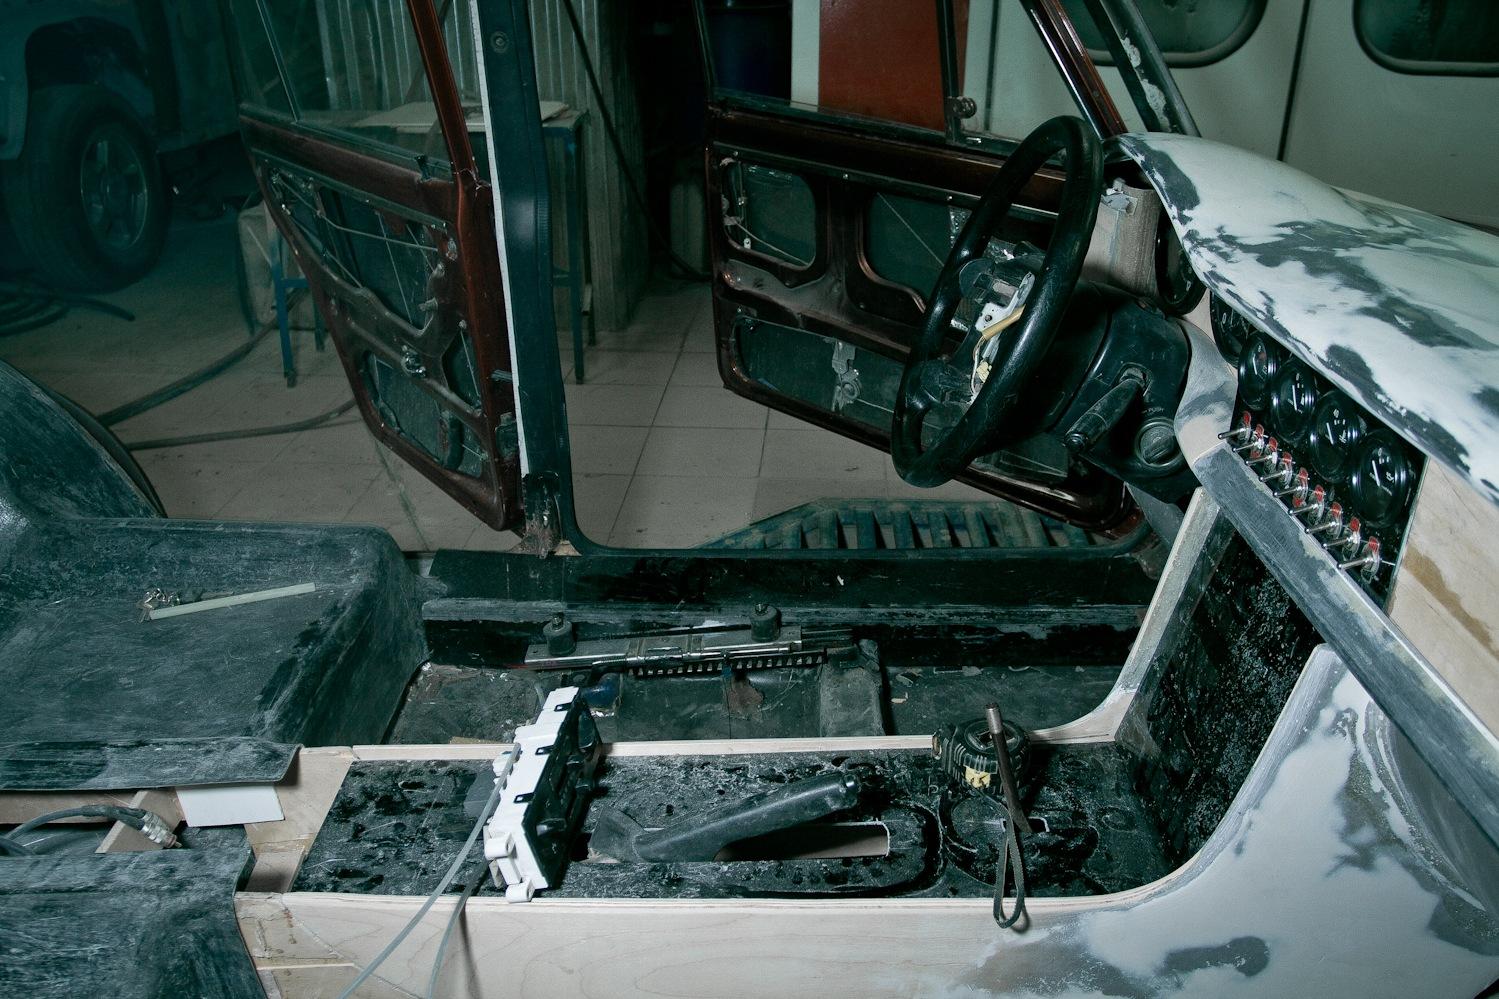 Тюнинг панели приборов своими руками на ваз 2106 видео